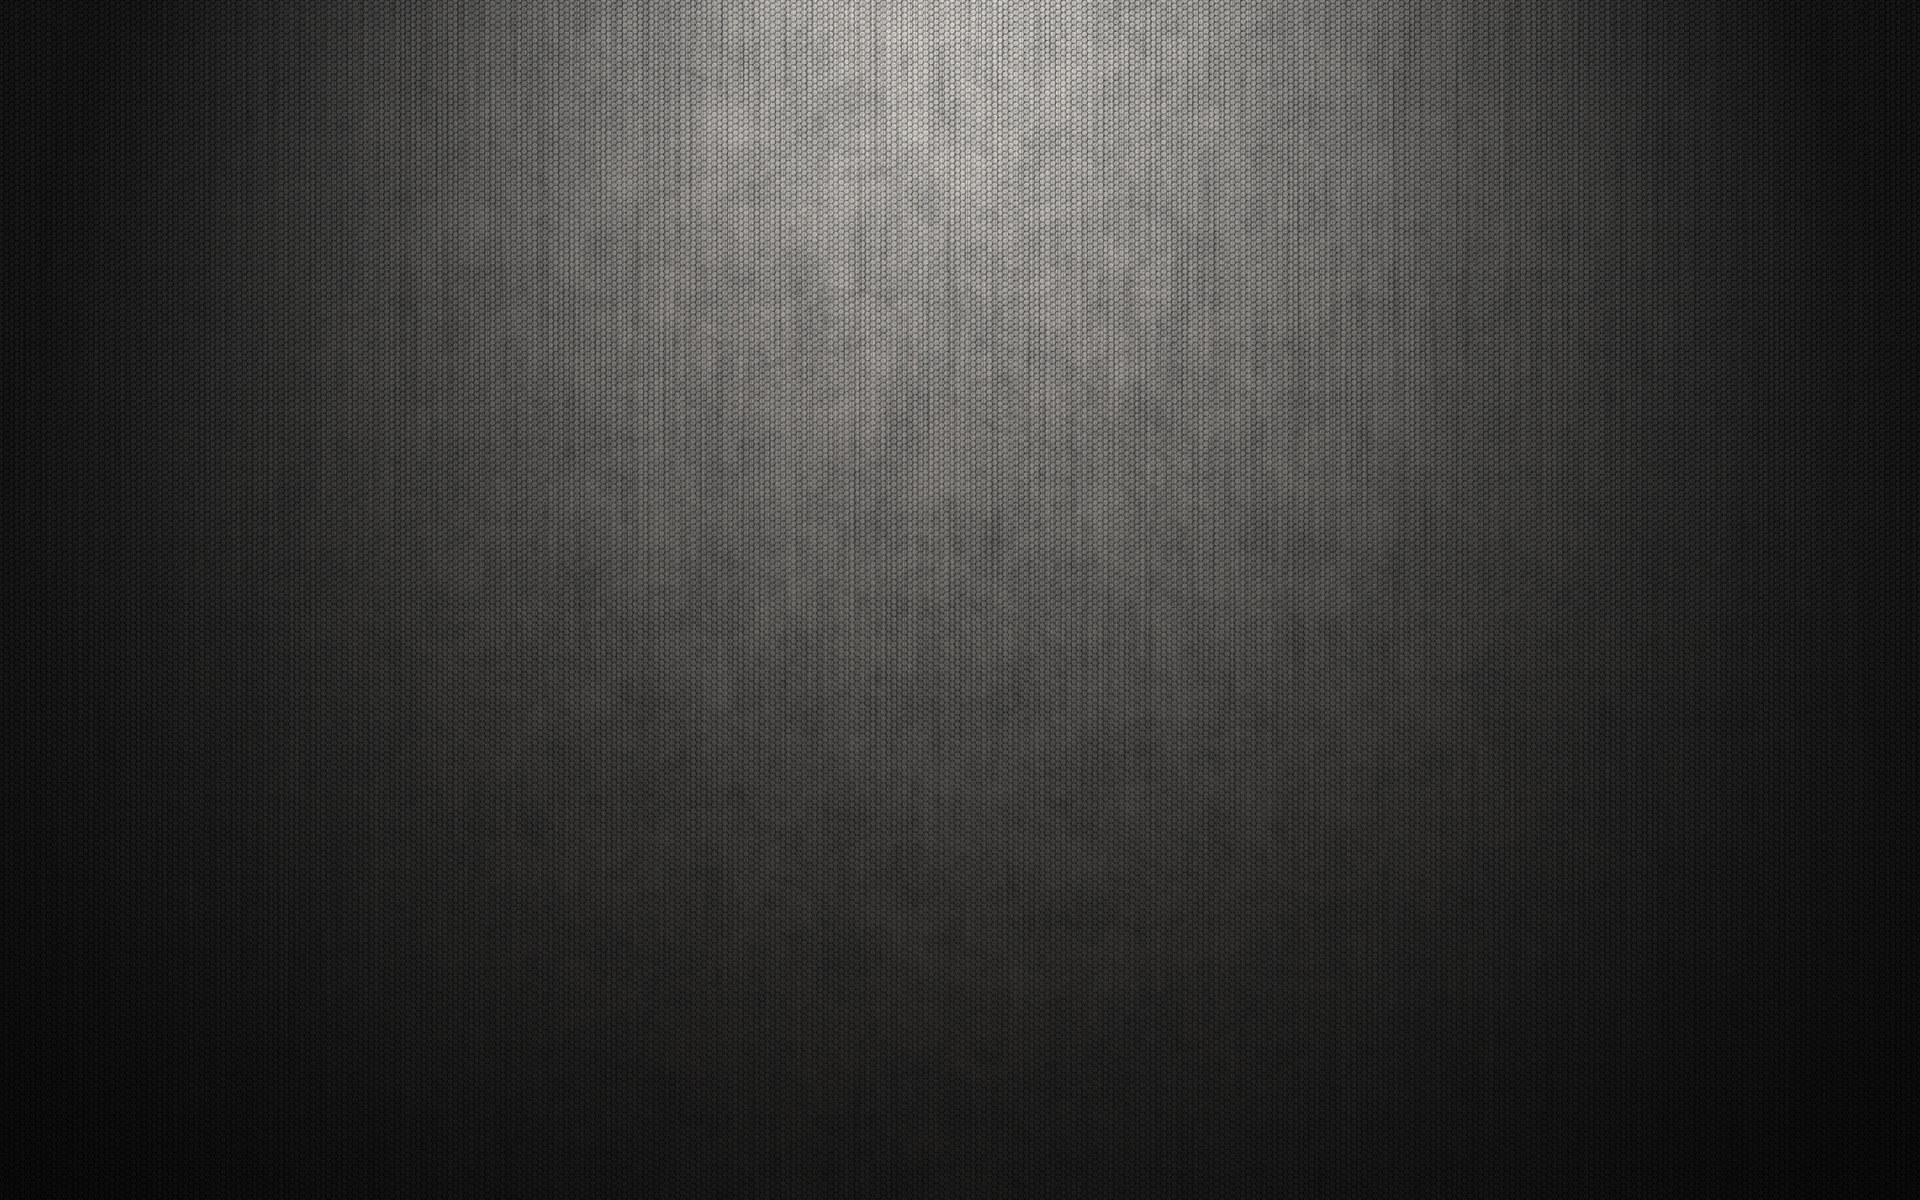 Текстура, текстуры, чёрный, фон обои ...: hq-wallpapers.ru/wallpapers/abstraction3d/pic60422_raz1920x1200